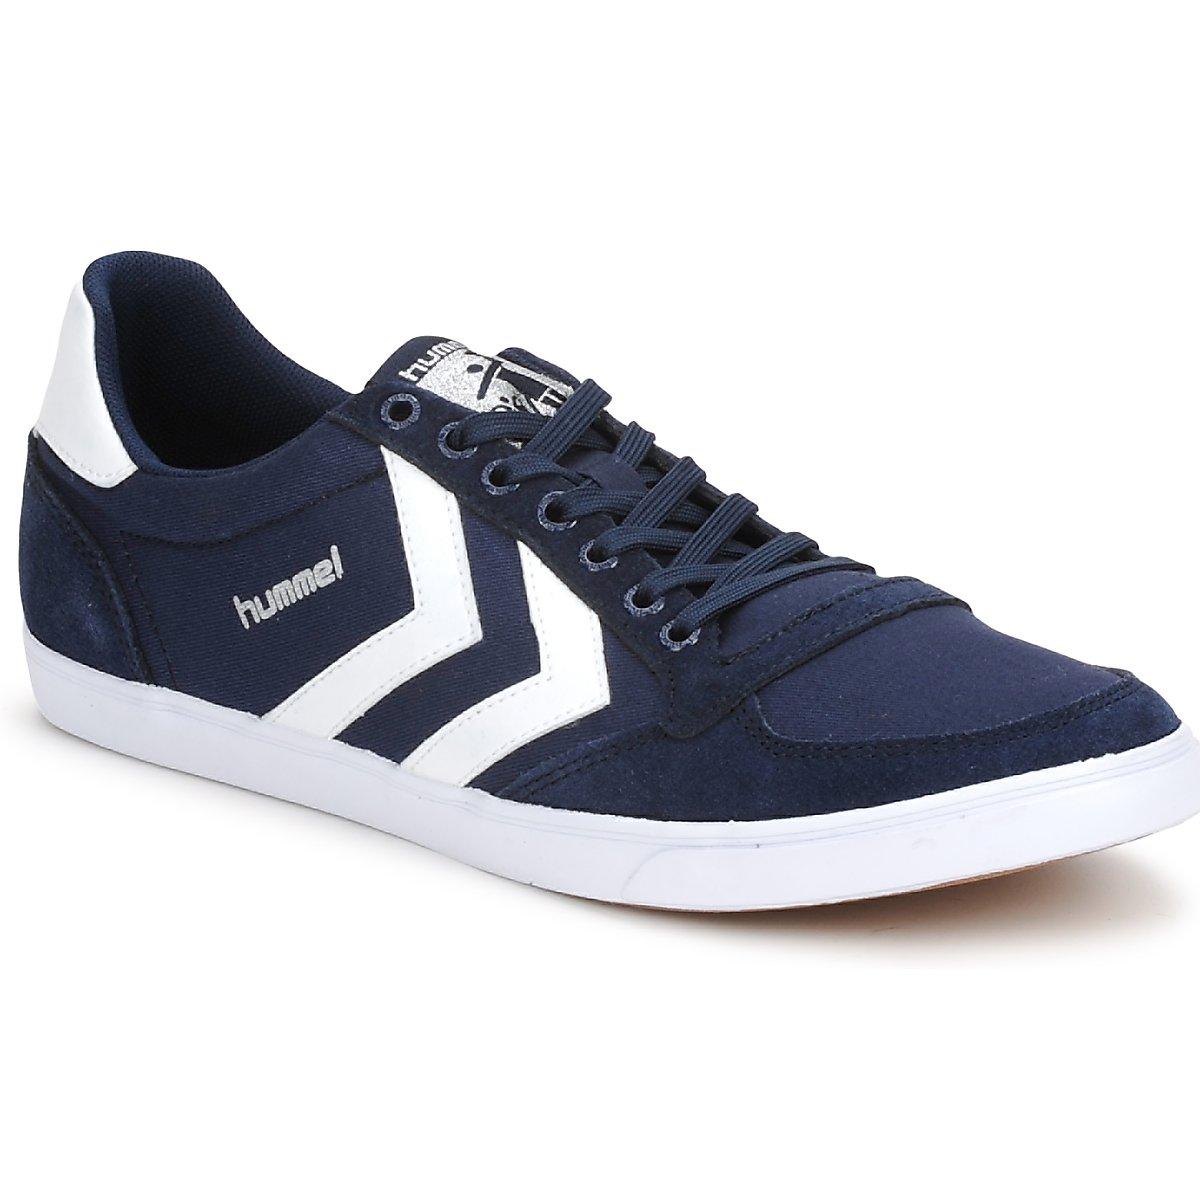 Shoes Stadil Hummel Slimmer Dress White Cheap Low Blue PXlwOkZiuT